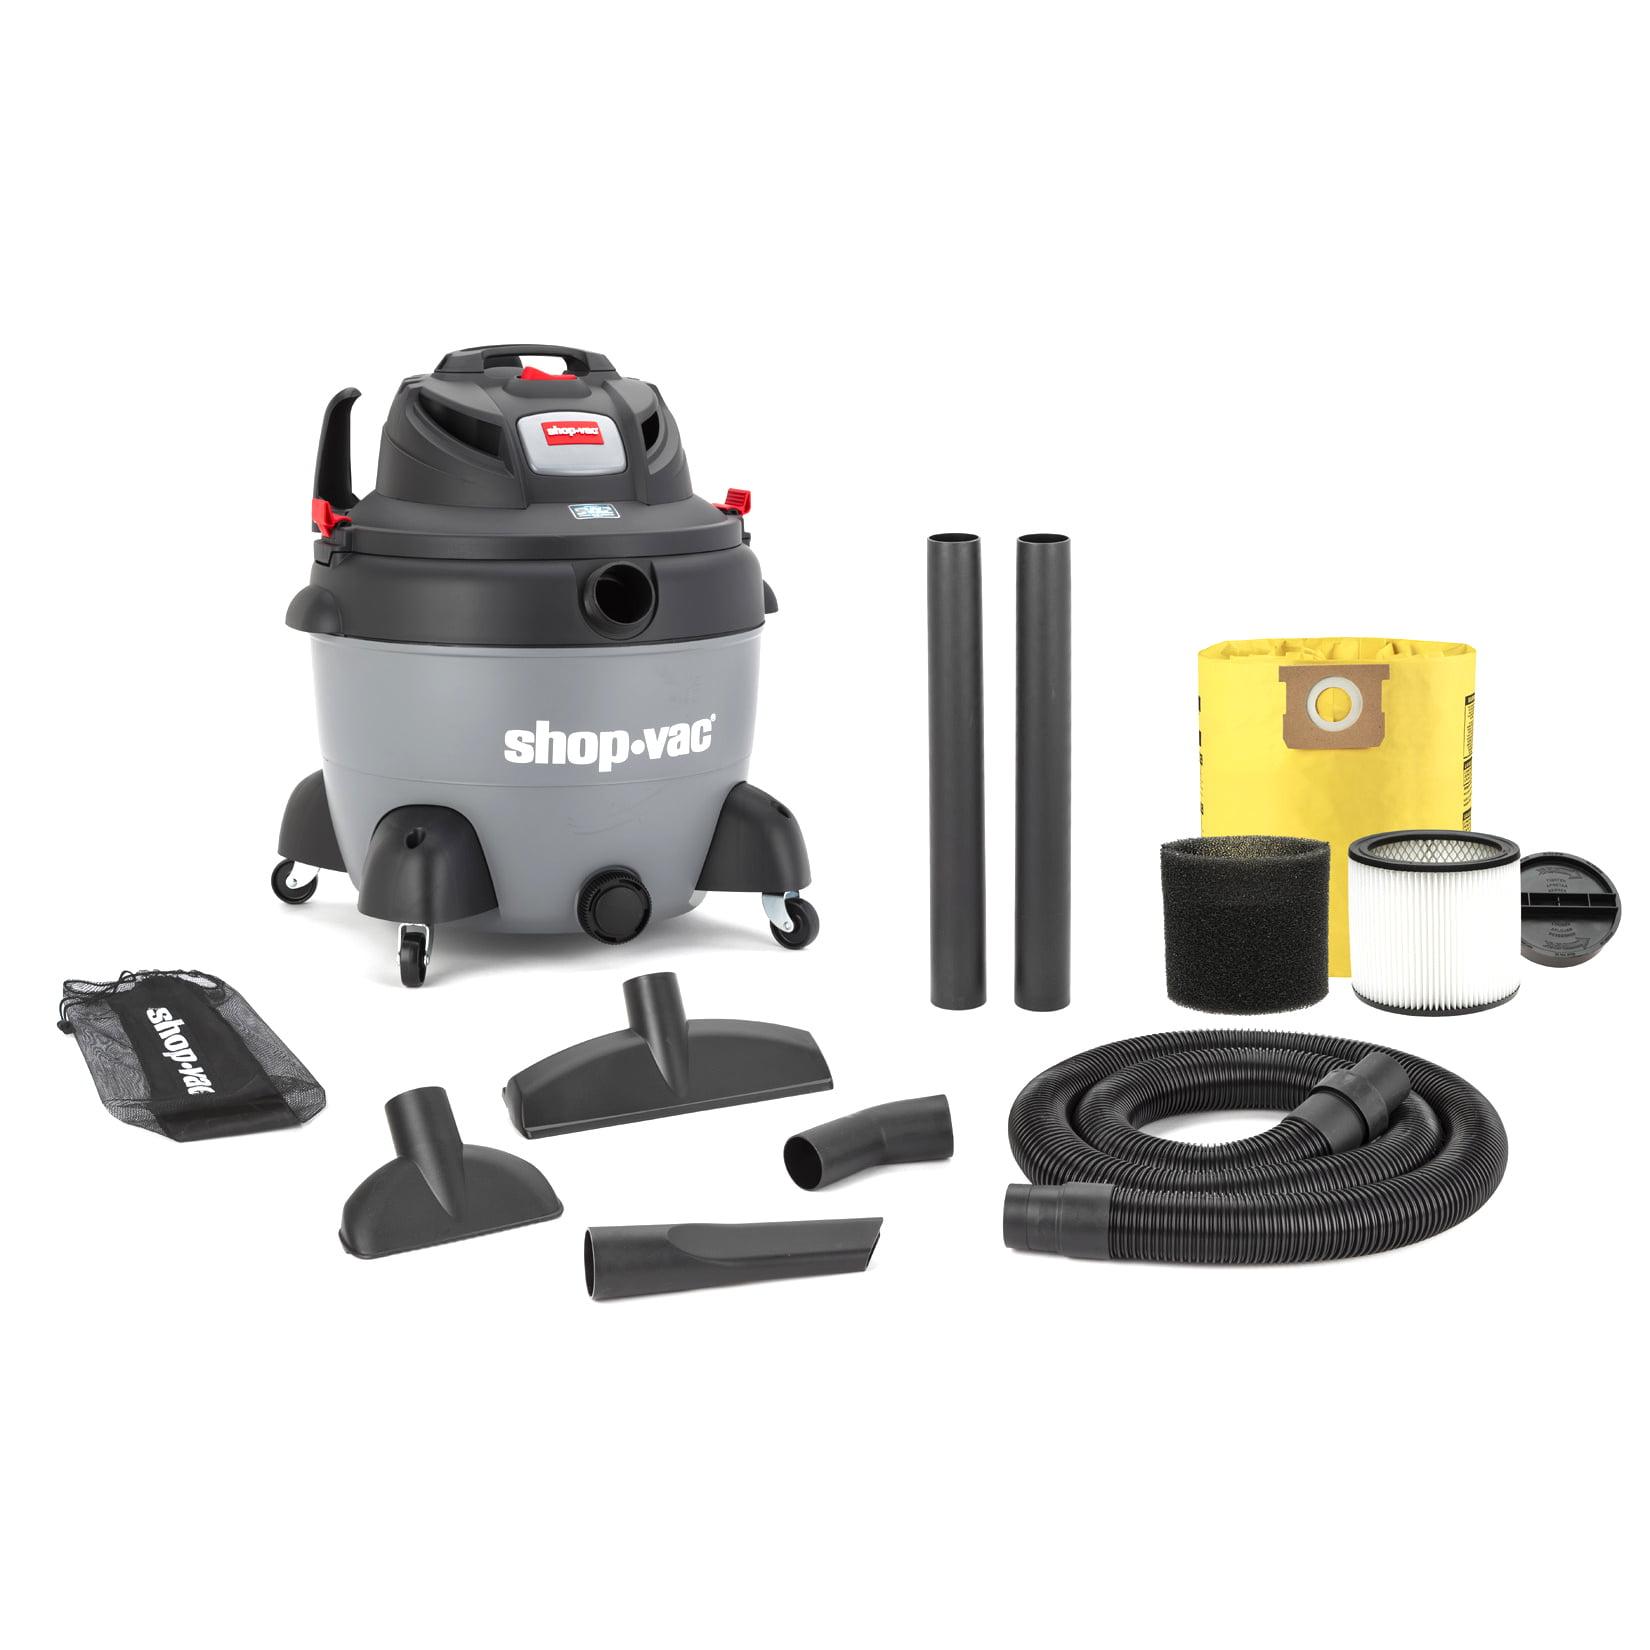 Shop Vac 825-26-00 16 Gallon 6.5 HP Hardware Series SVX2 Wet & Dry Vacuum